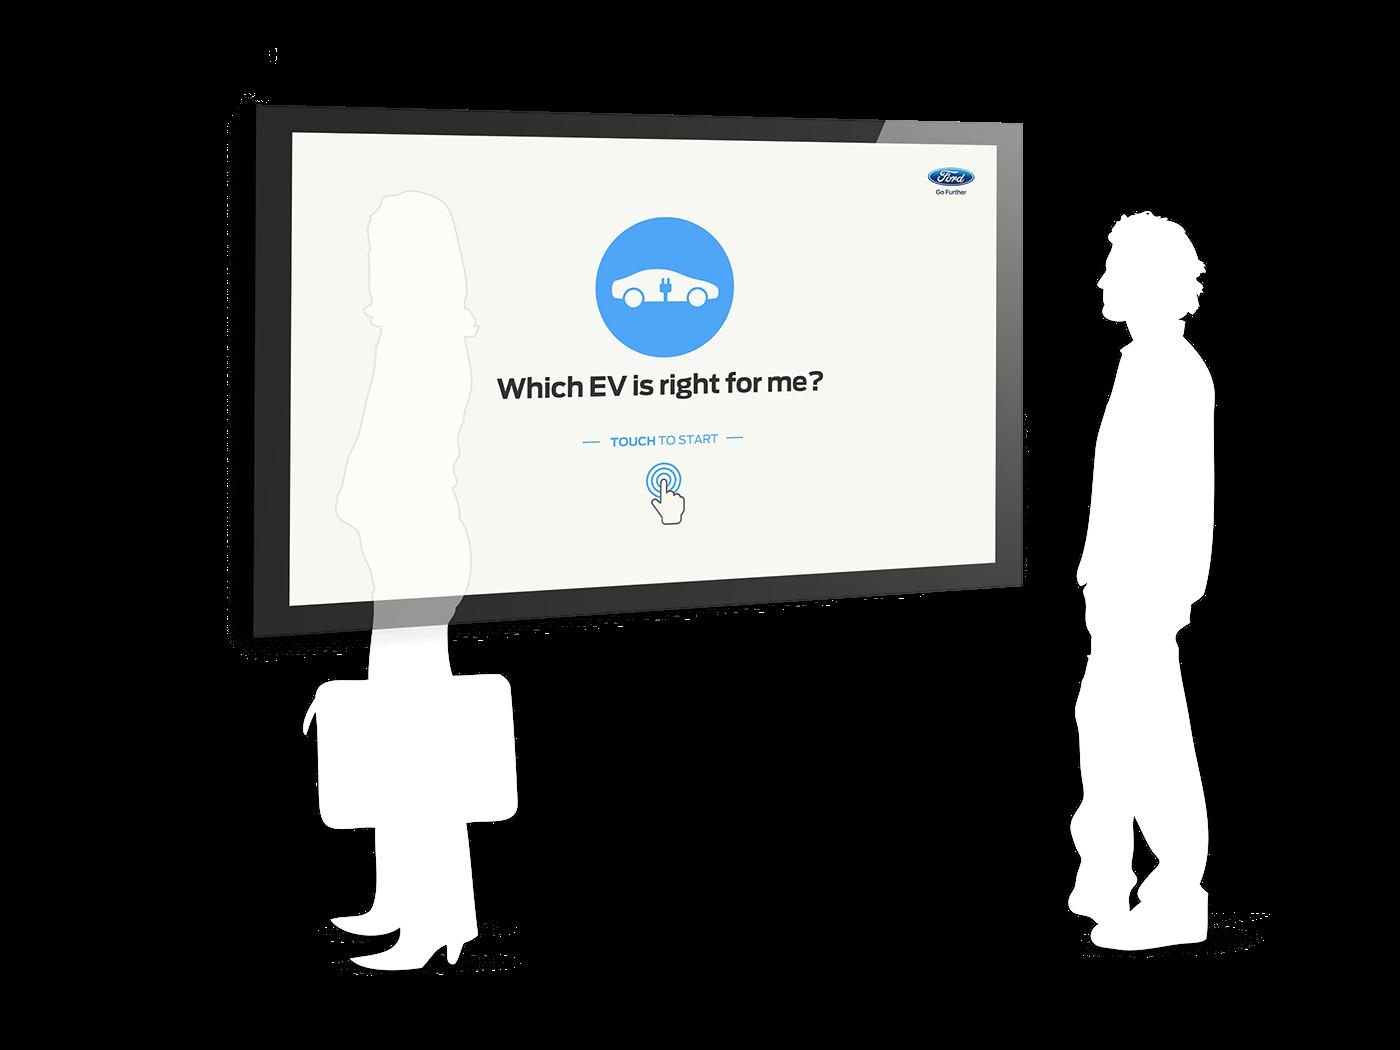 touchscreen application